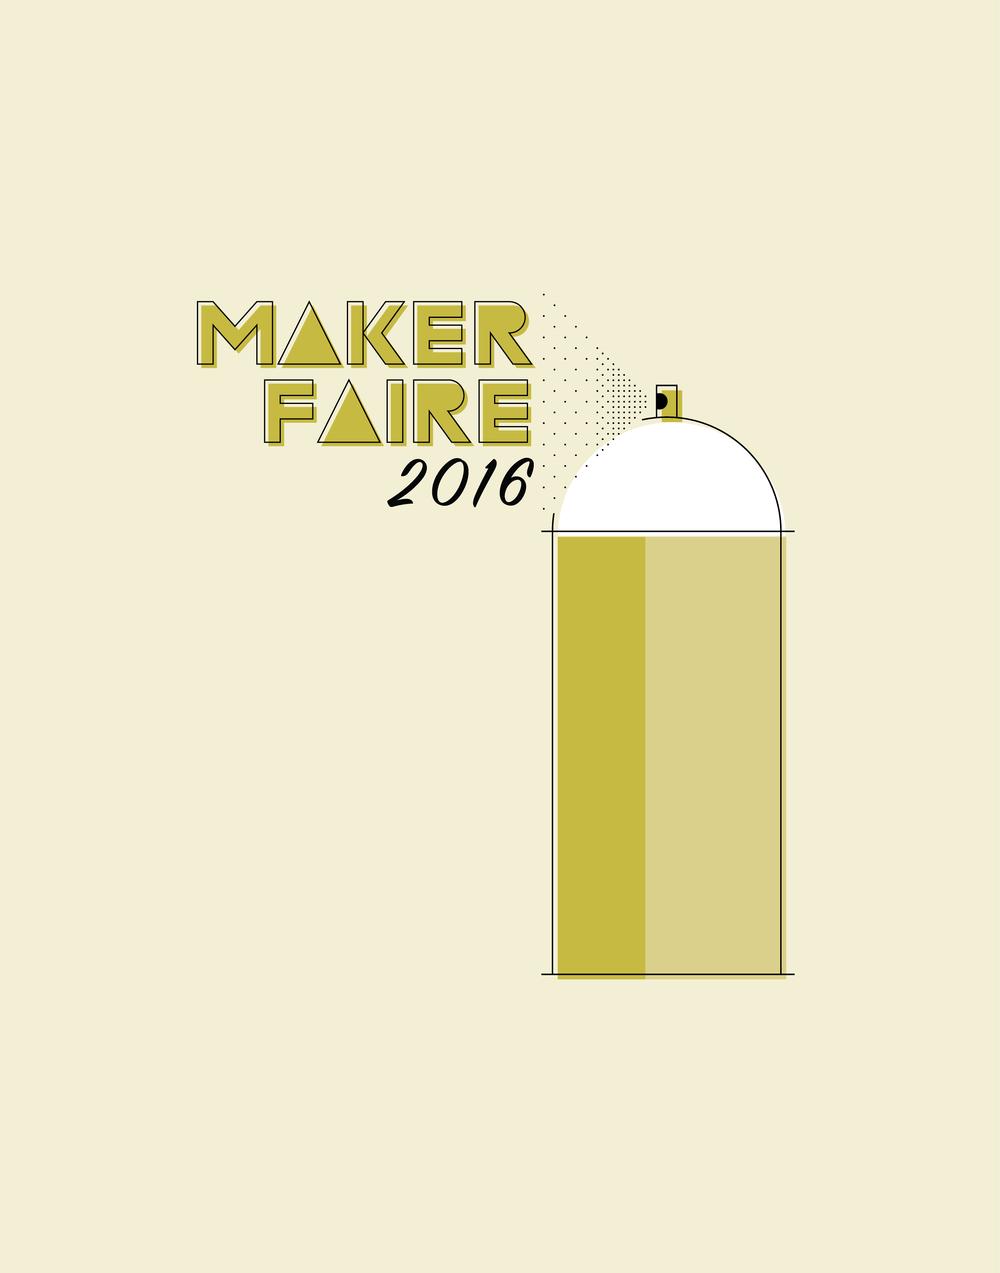 maker-2016-04.png